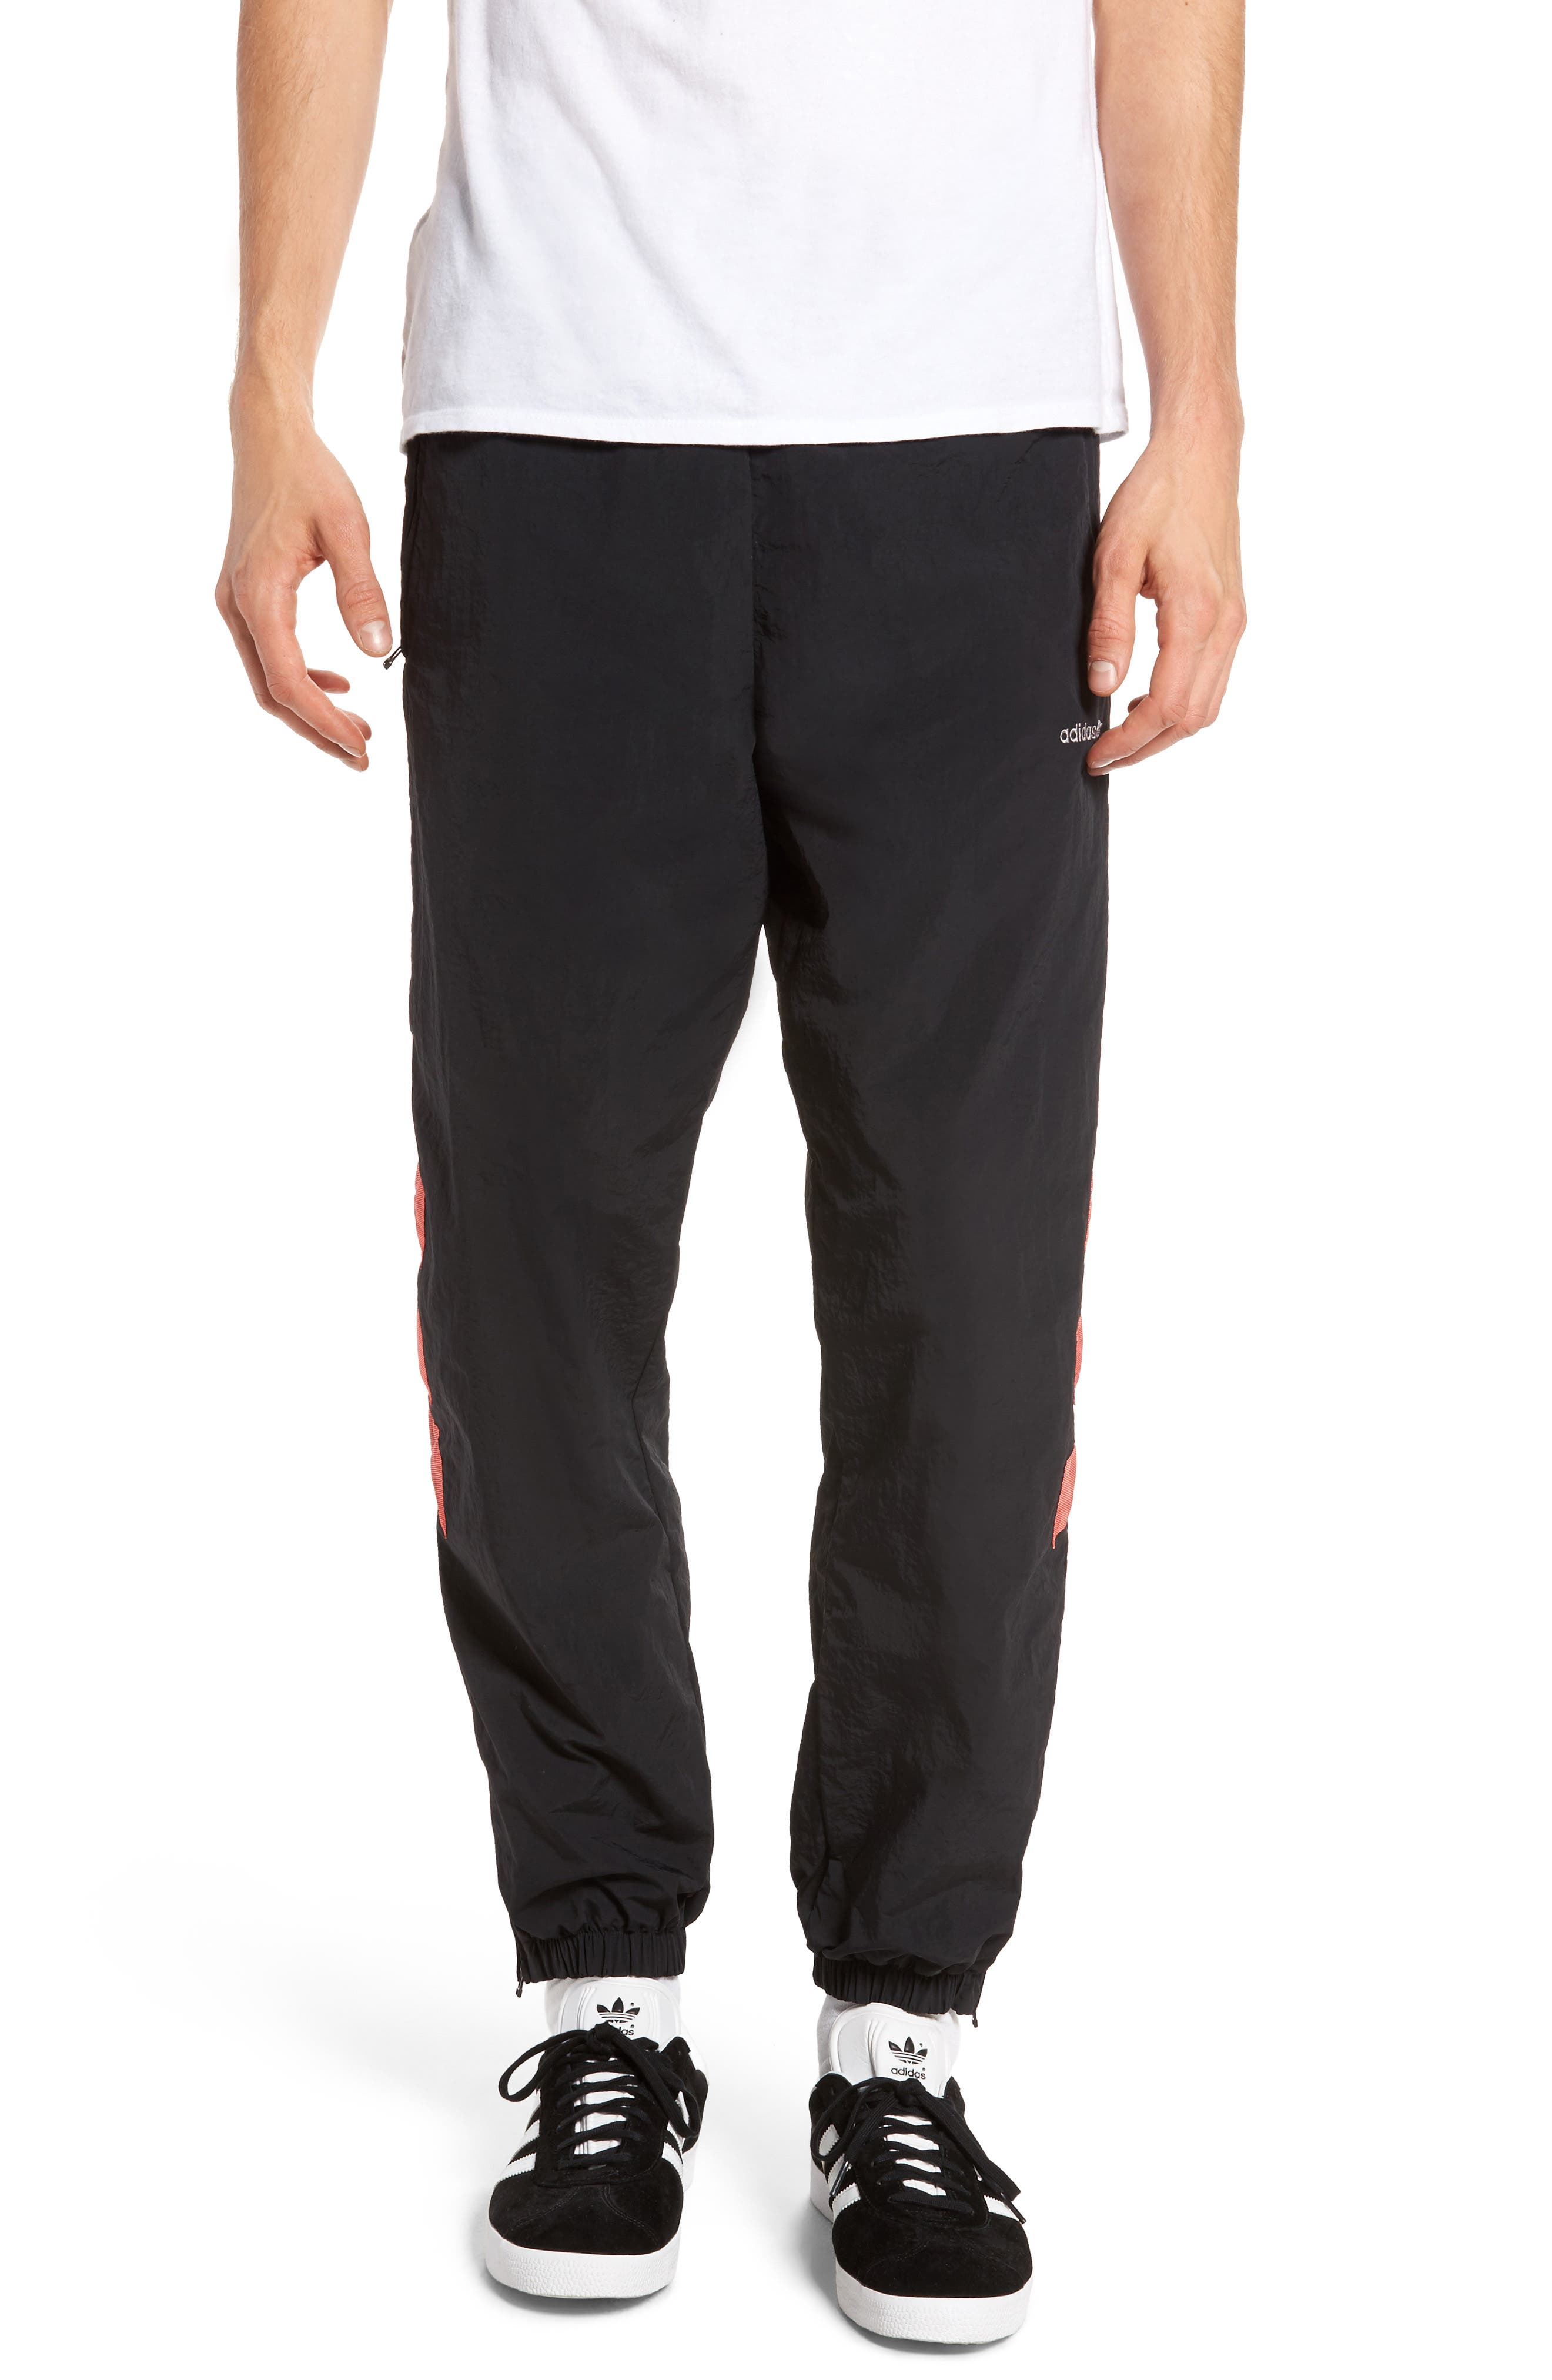 Originals Tironti Windpants,                         Main,                         color, Black/ Grey